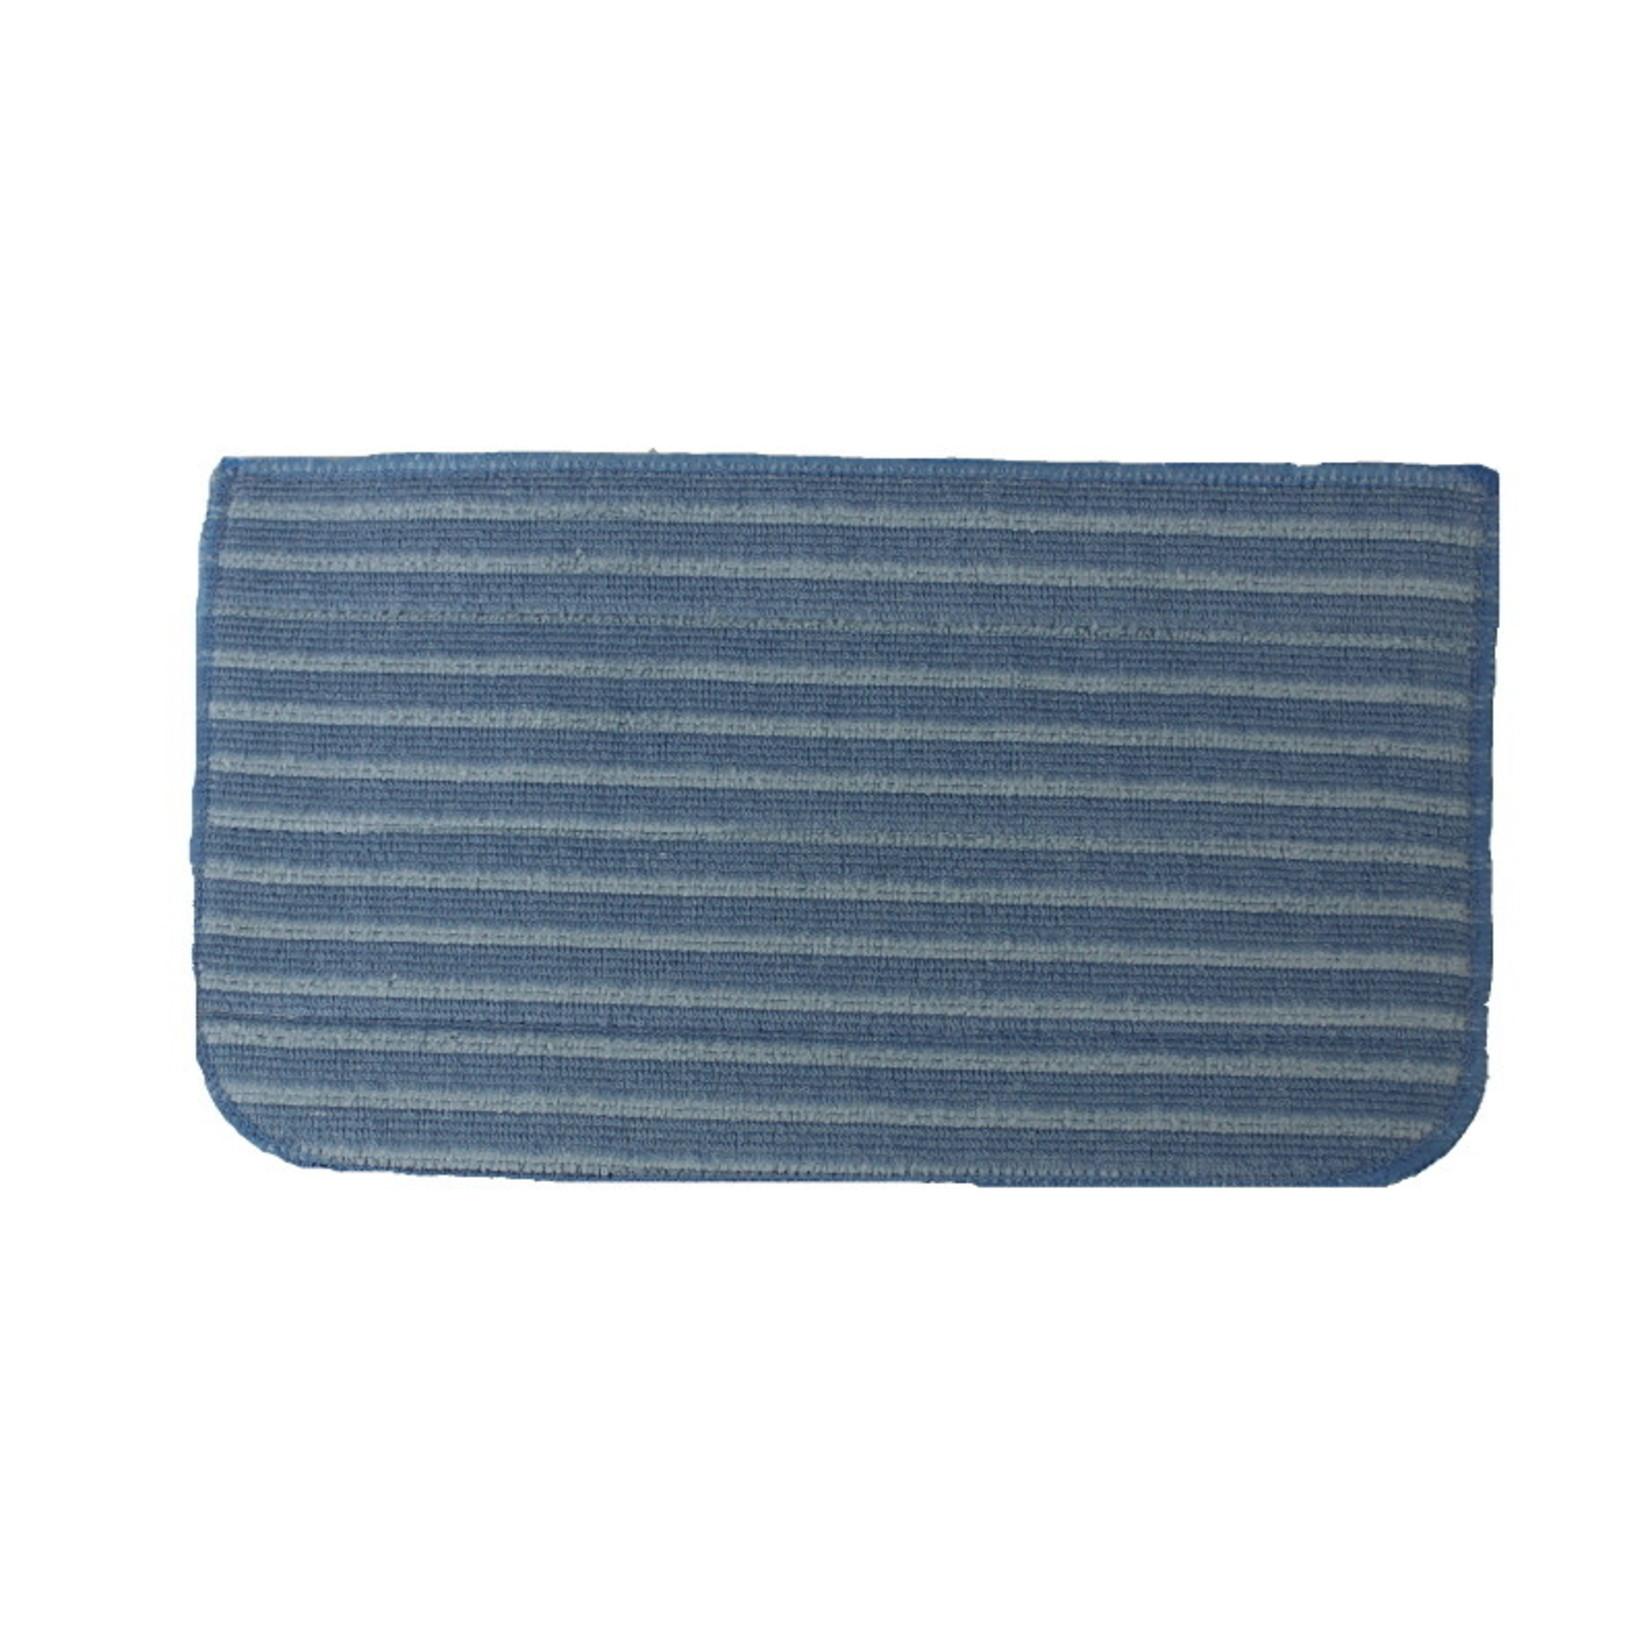 Vapamore Vapamore Microfiber Pads VP-100